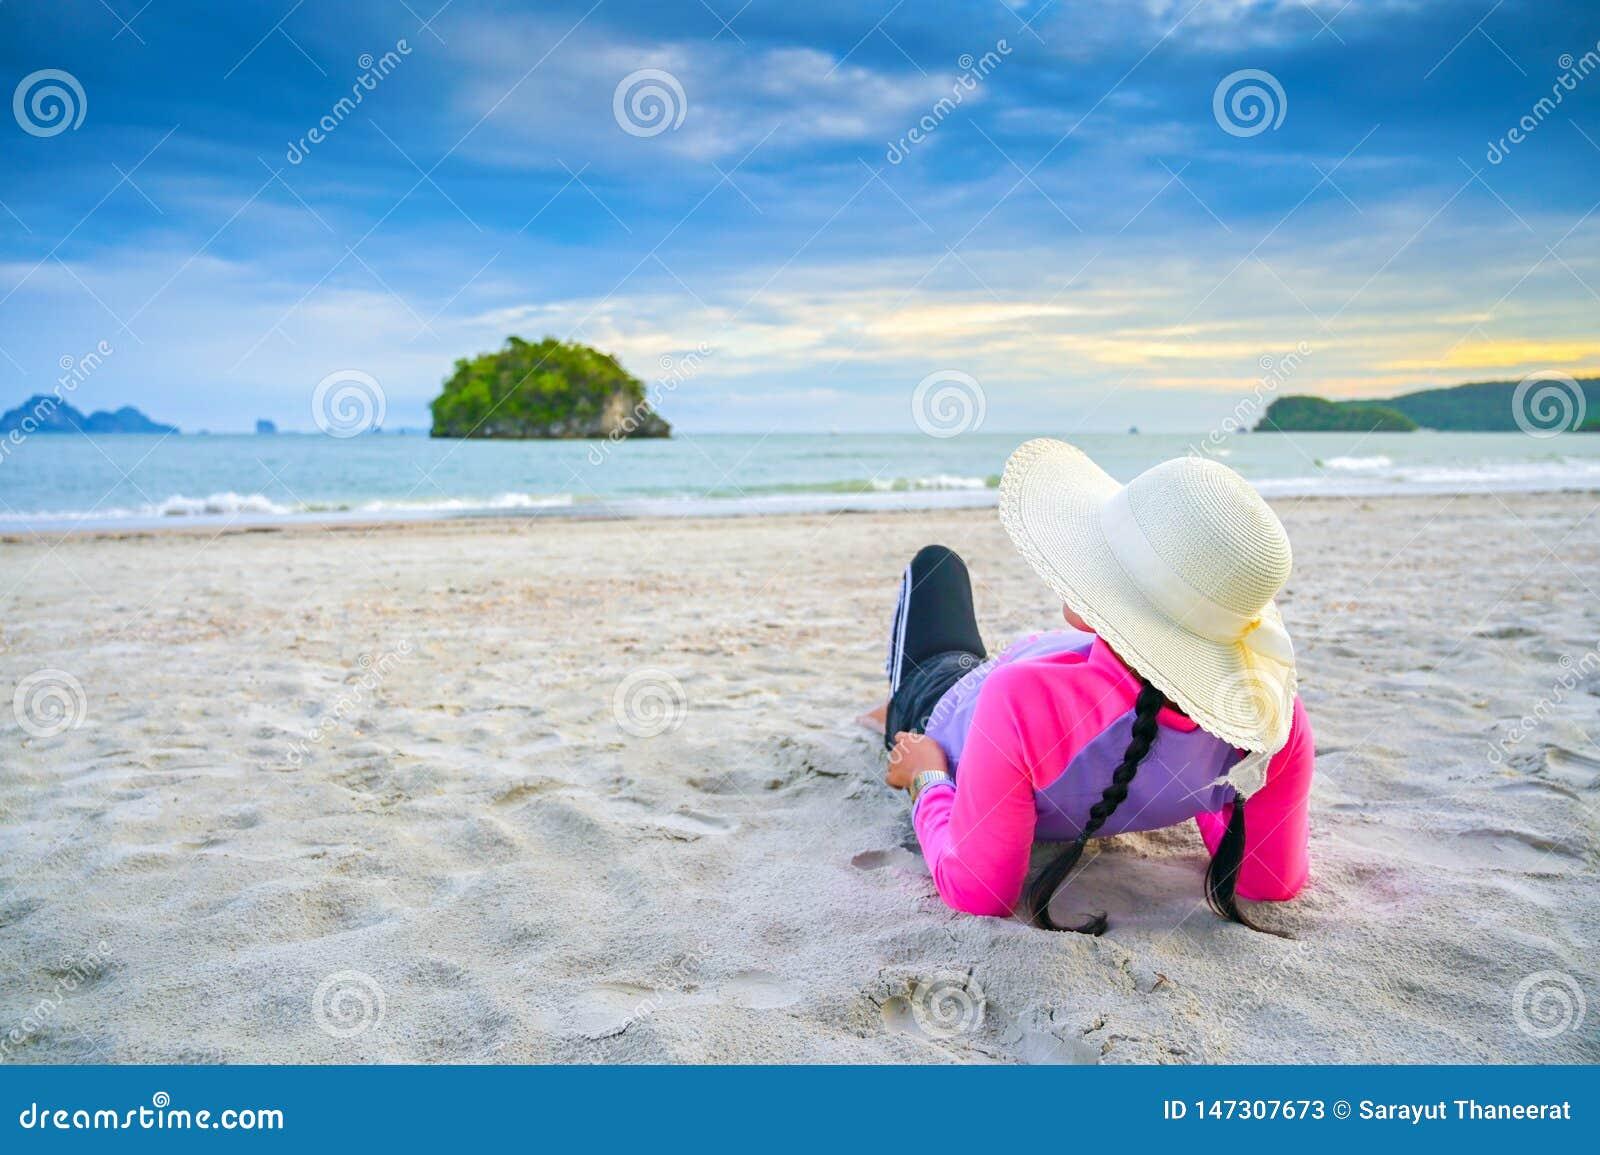 Women wearing hats are sleeping on the beach sea